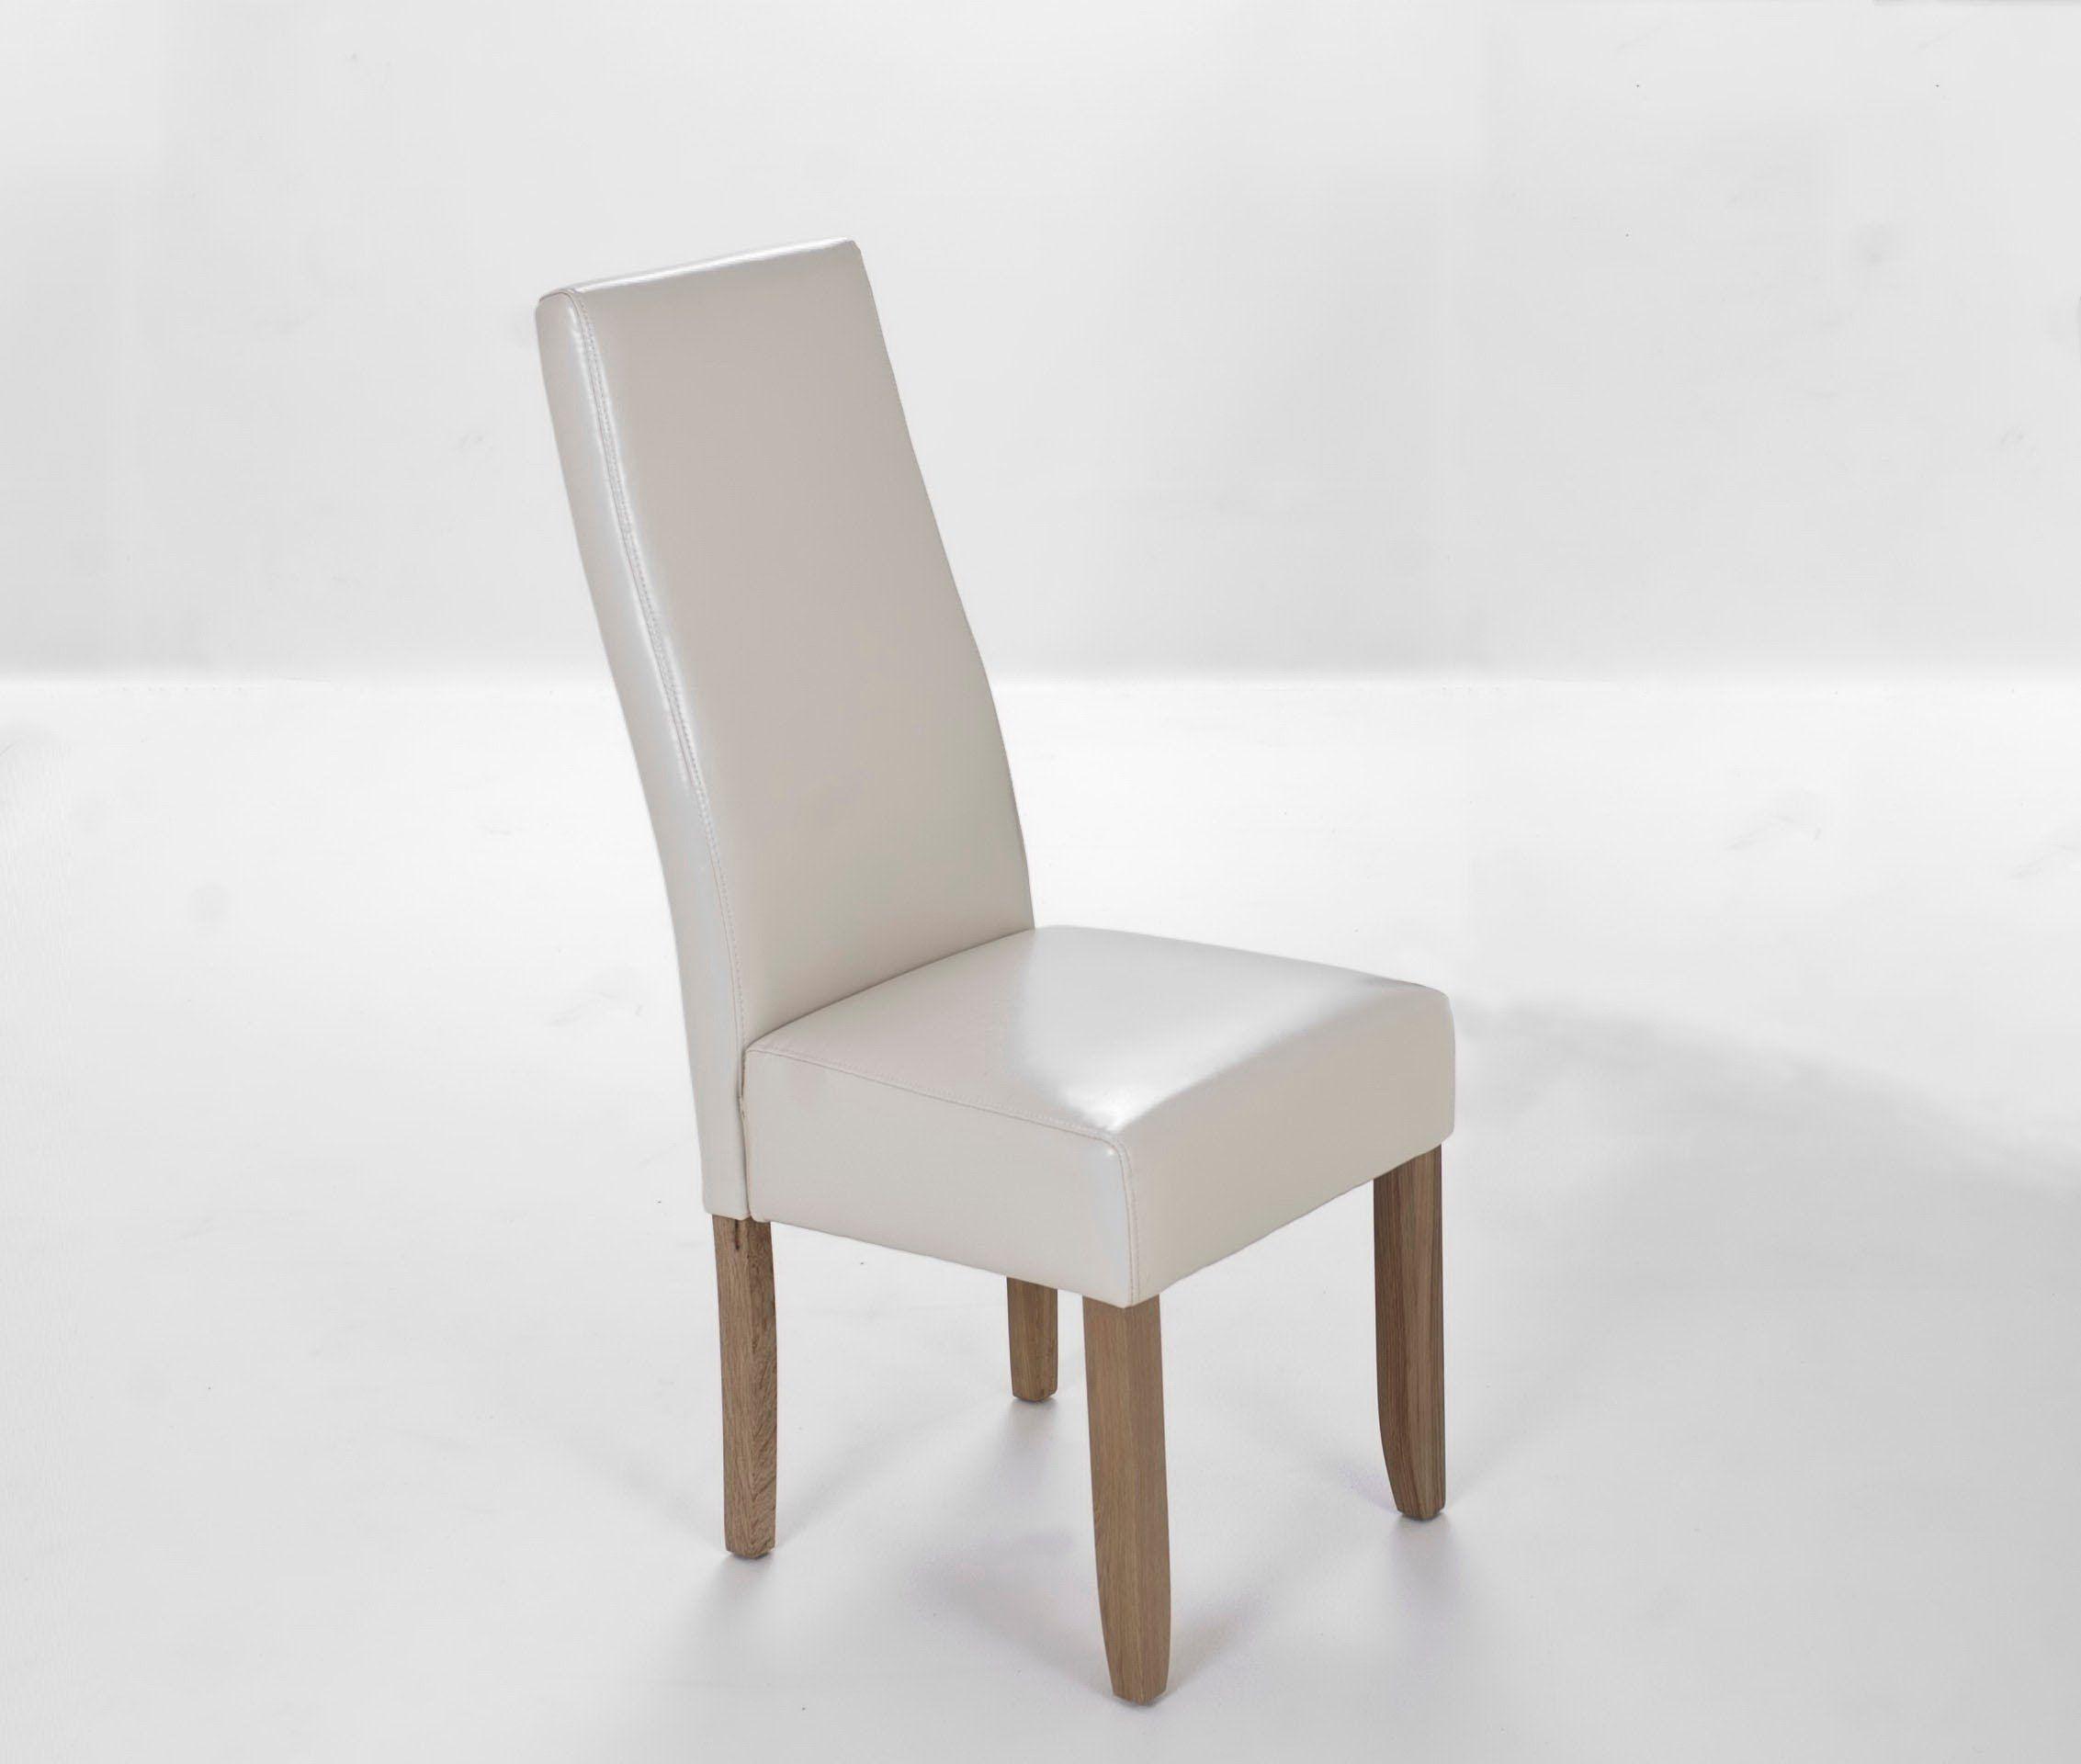 impressionnant chaise en cuir beige salle manger